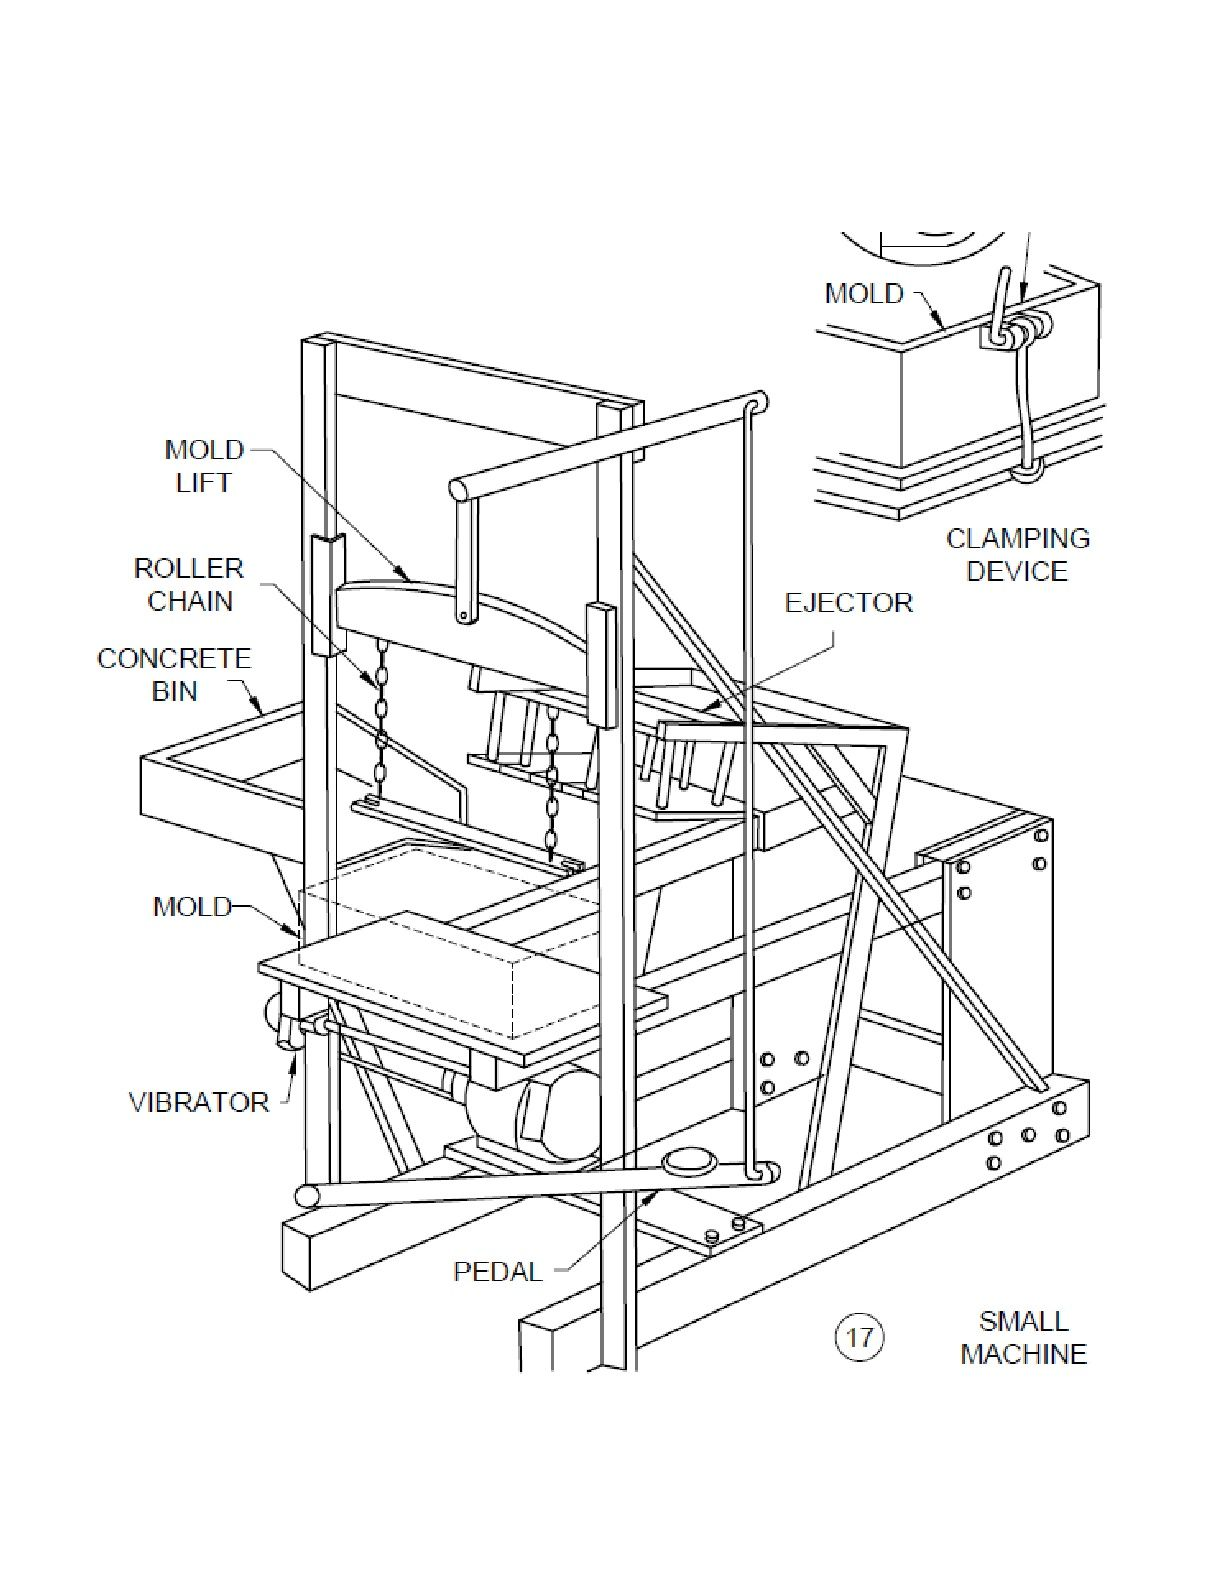 medium resolution of concrete block making machine plans diy cinder brick maker 100 blocks an hour